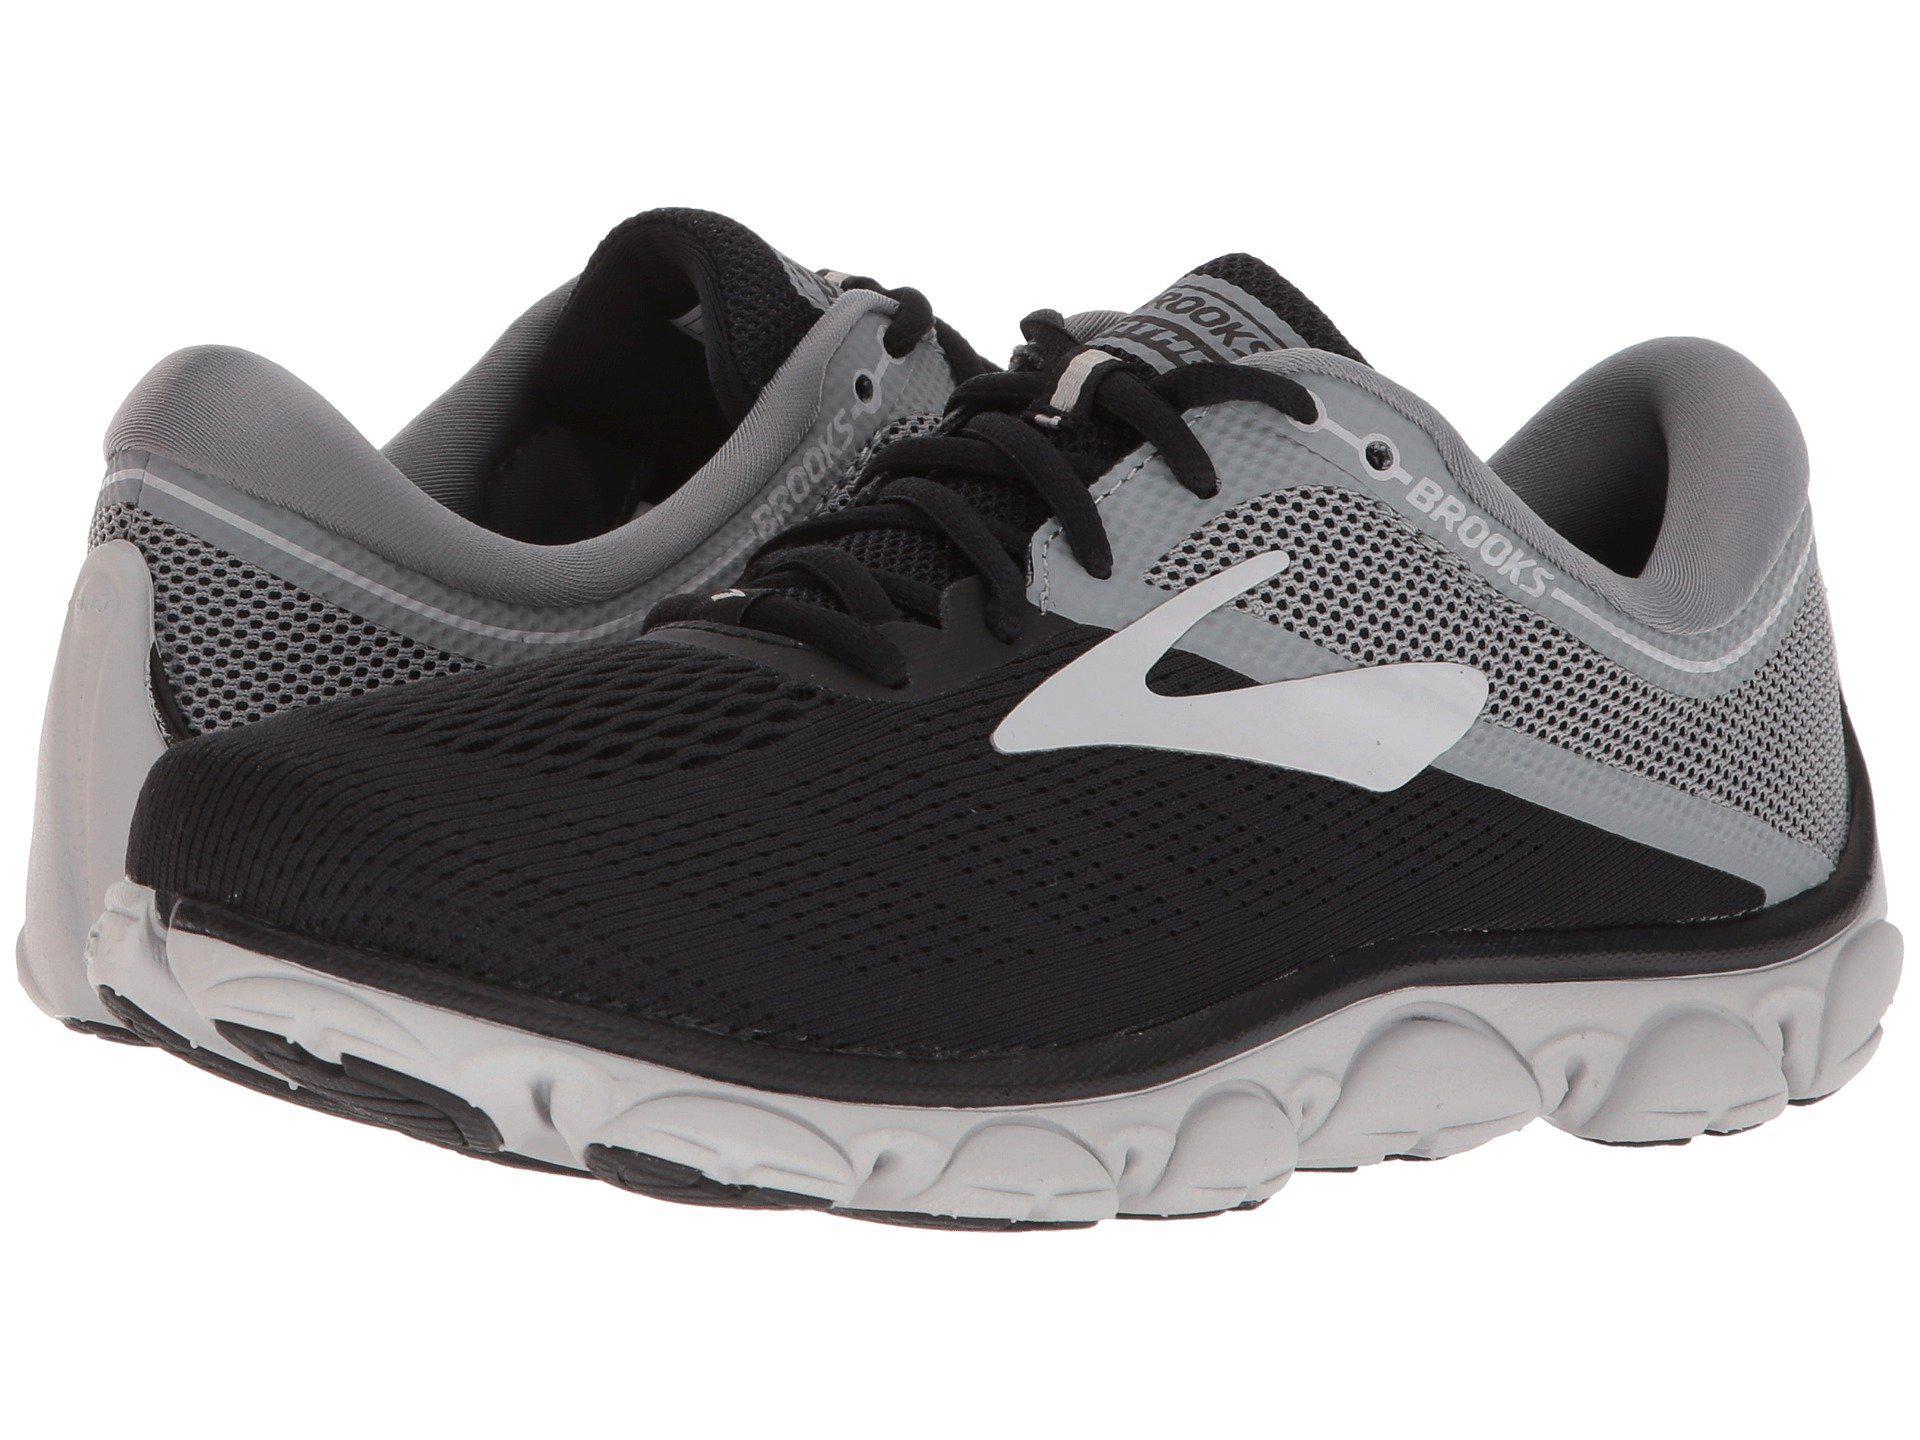 5c4b6fcca3f Lyst - Brooks Anthem (grey ebony pink) Women s Running Shoes in Black